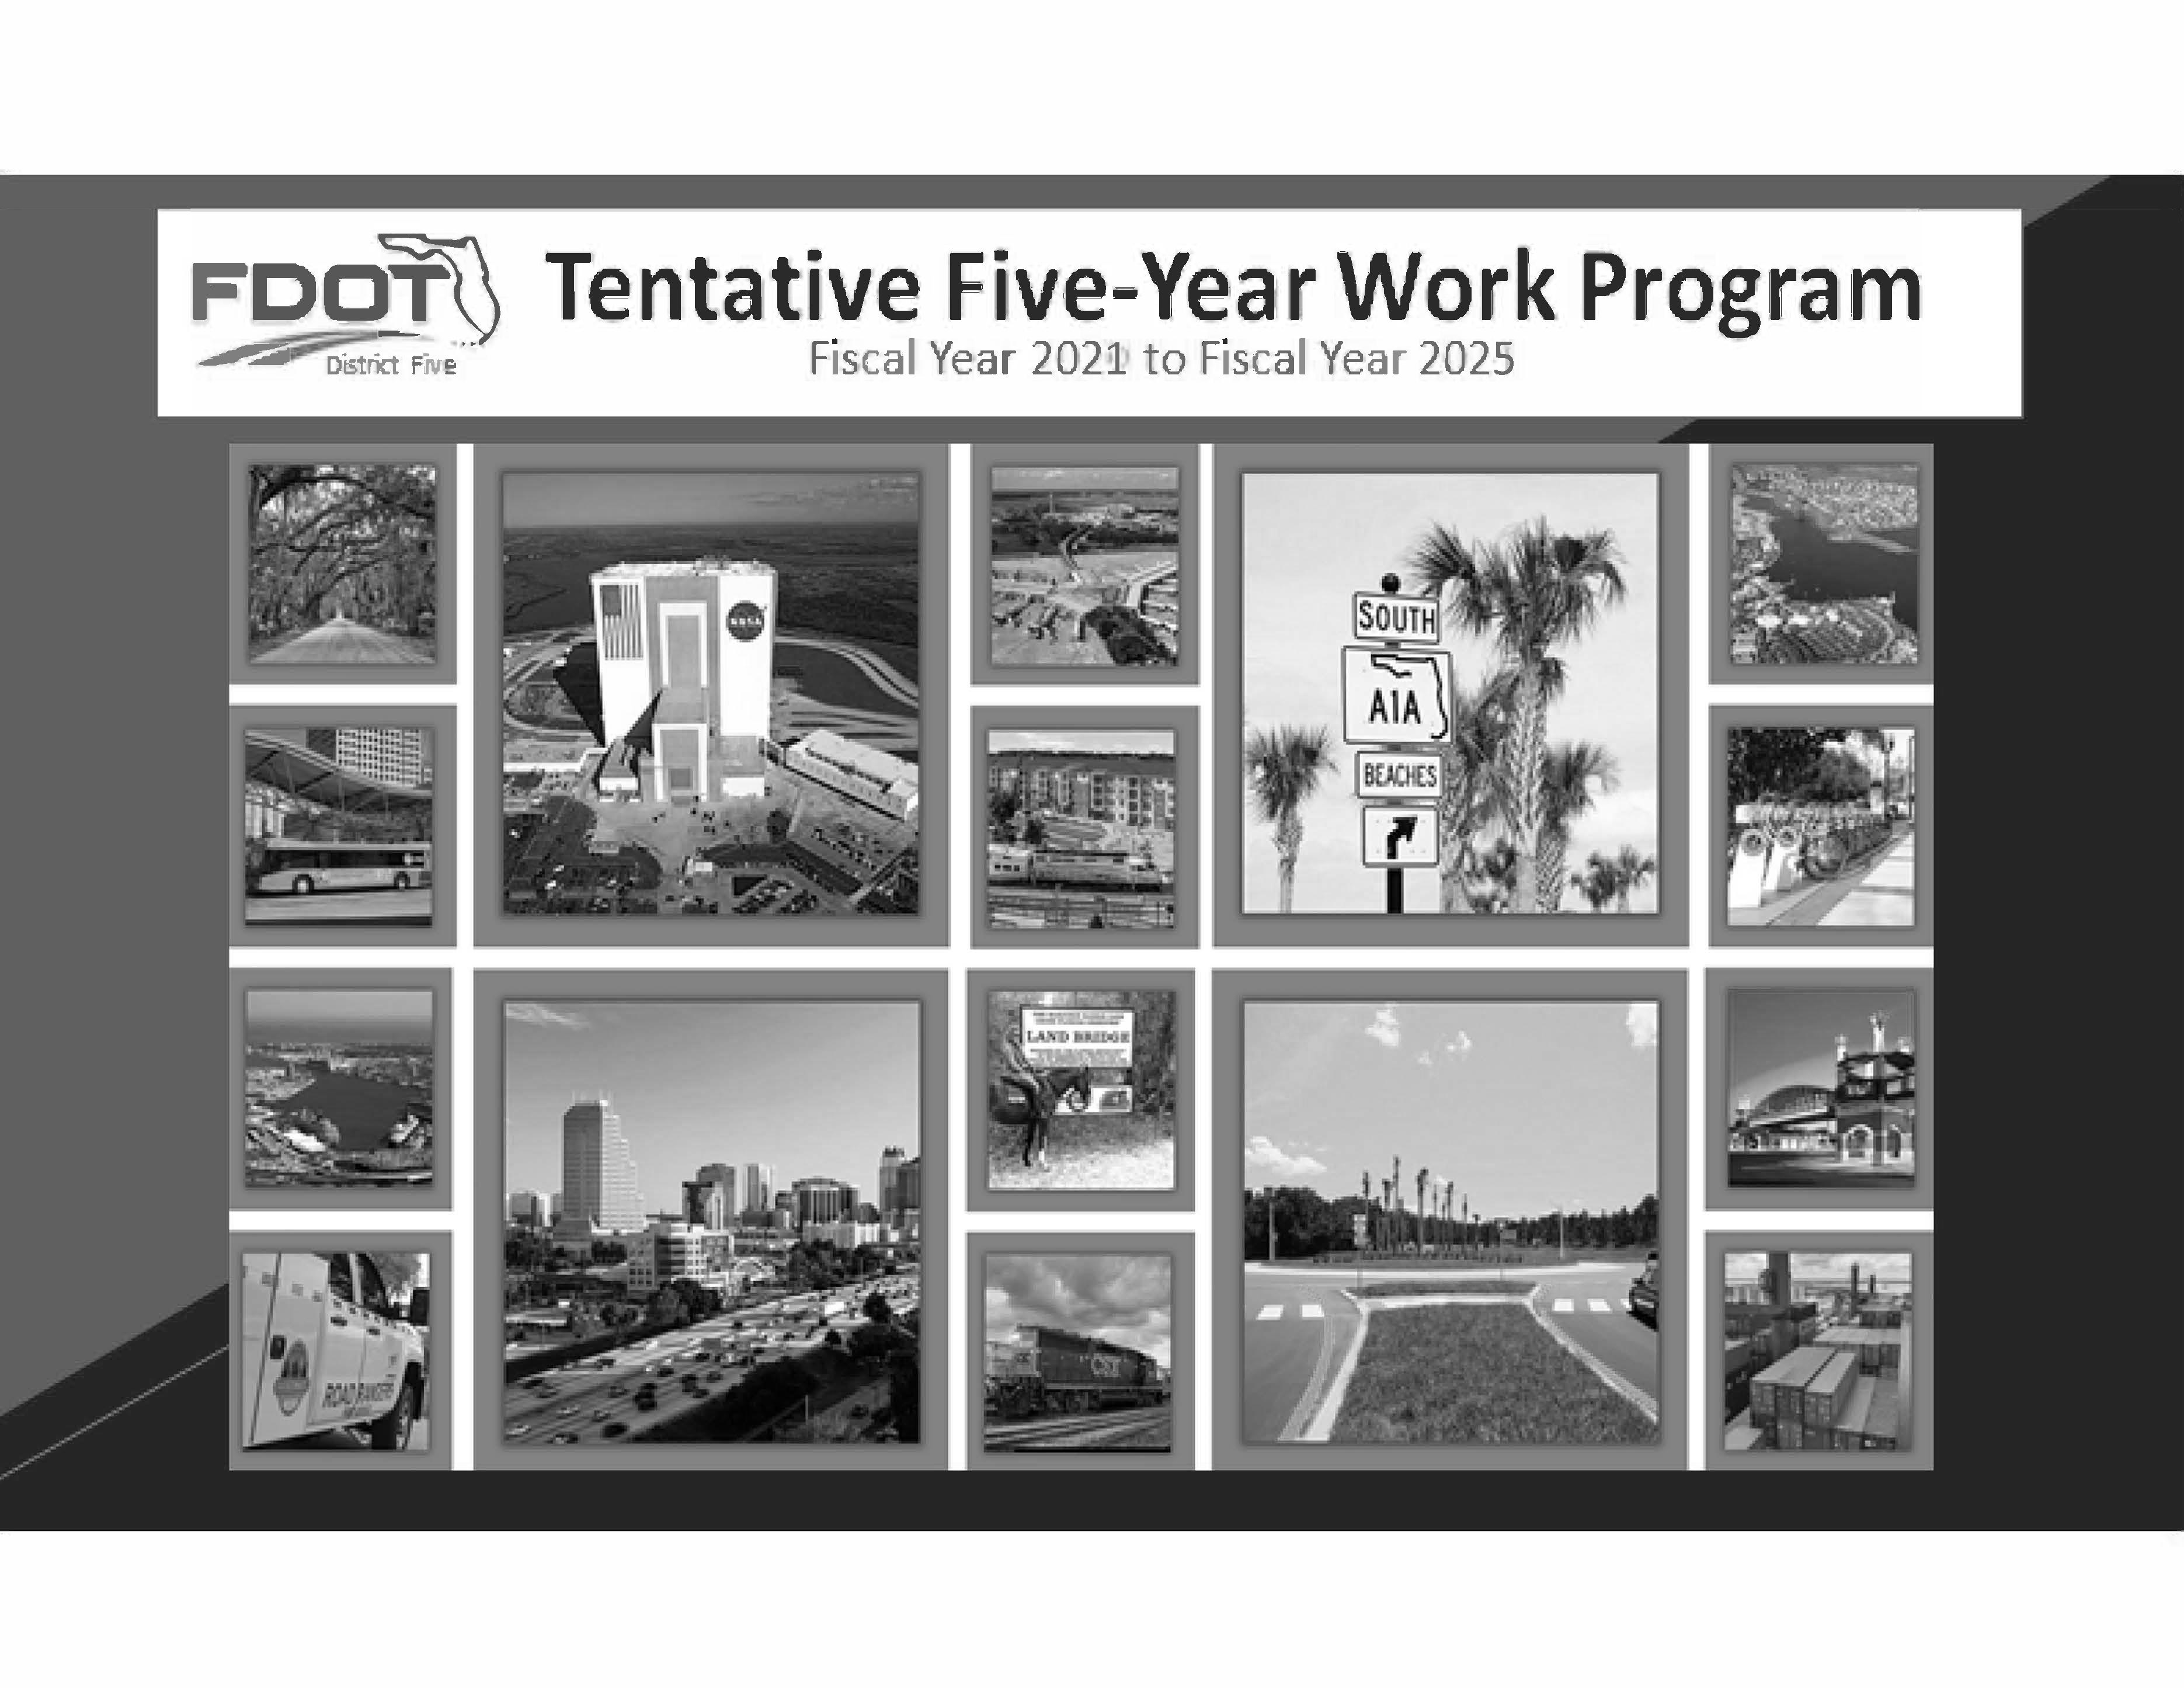 FDOT Five-Year Work Program